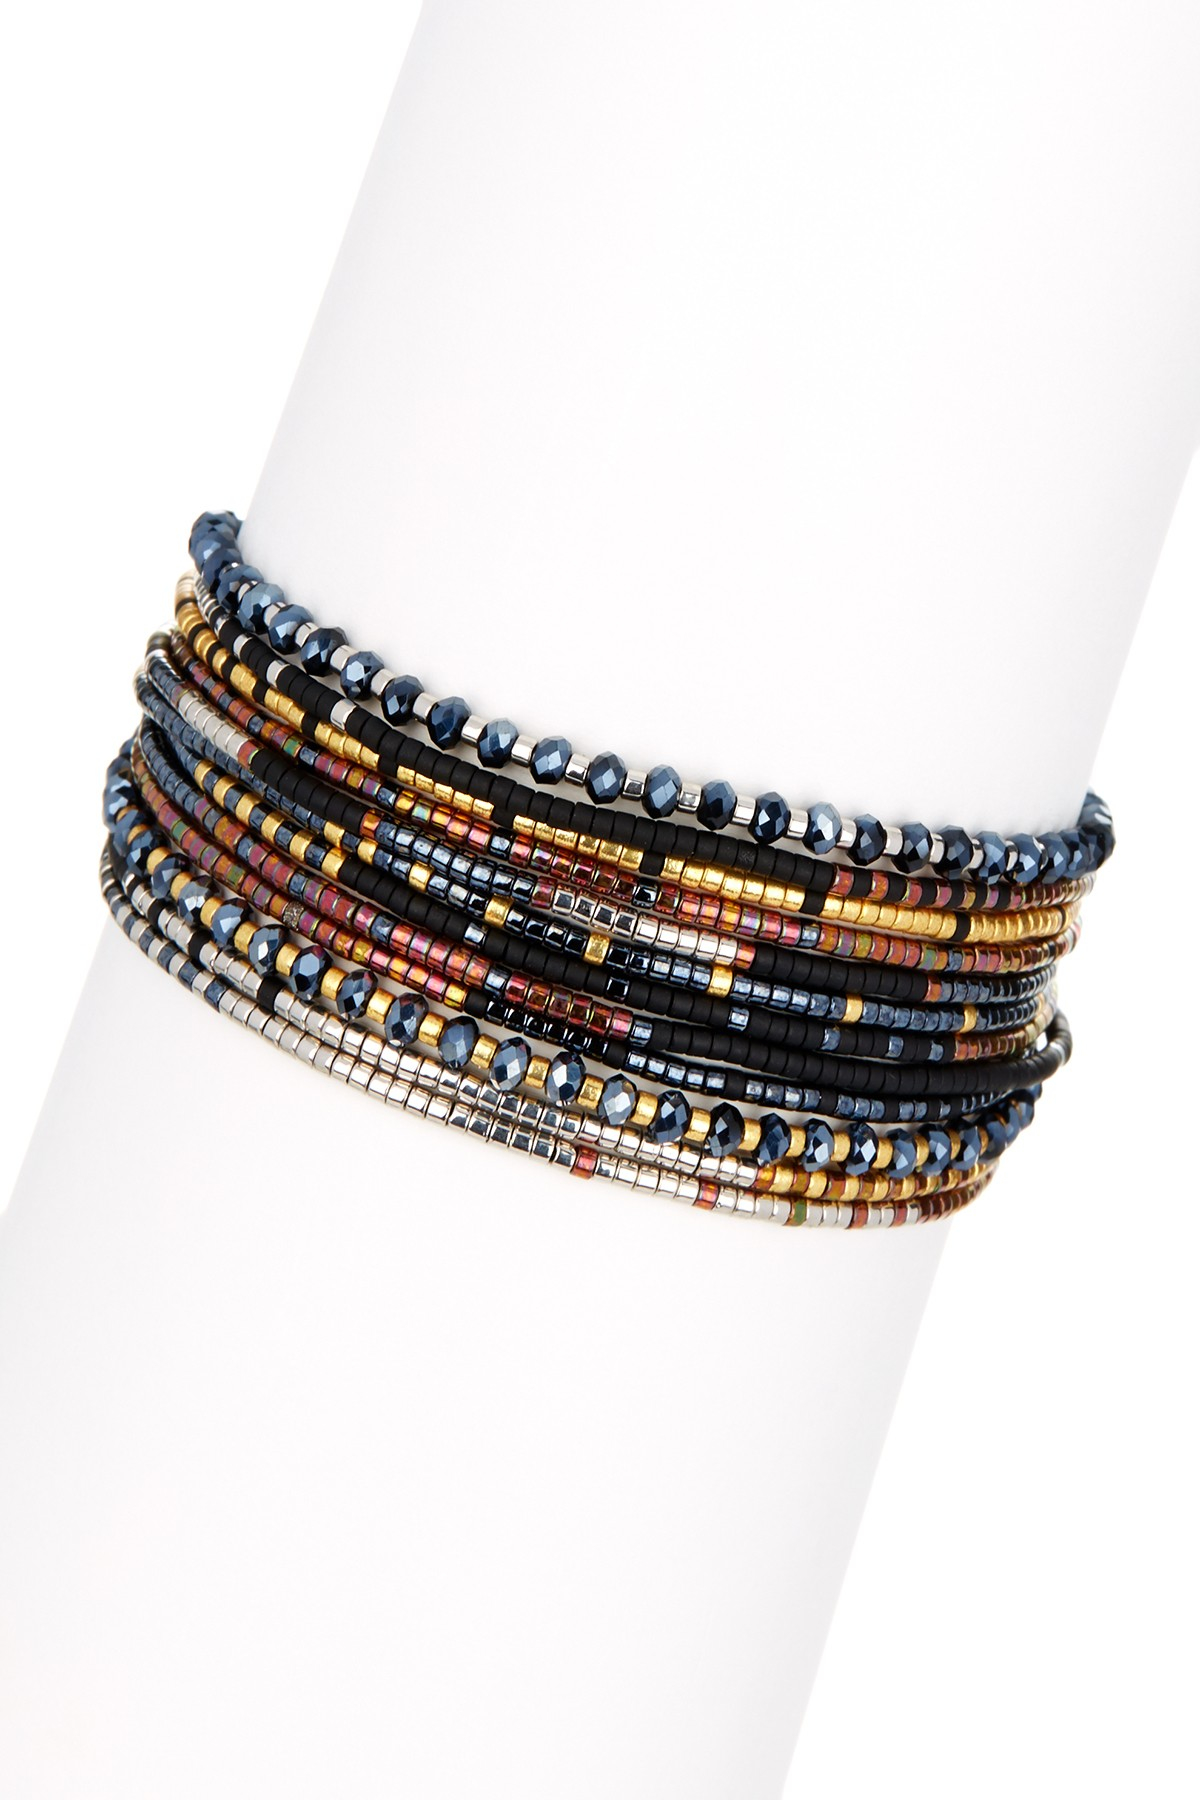 Chan Luu Synthetic Multi Strand Seed Bead Bracelet In